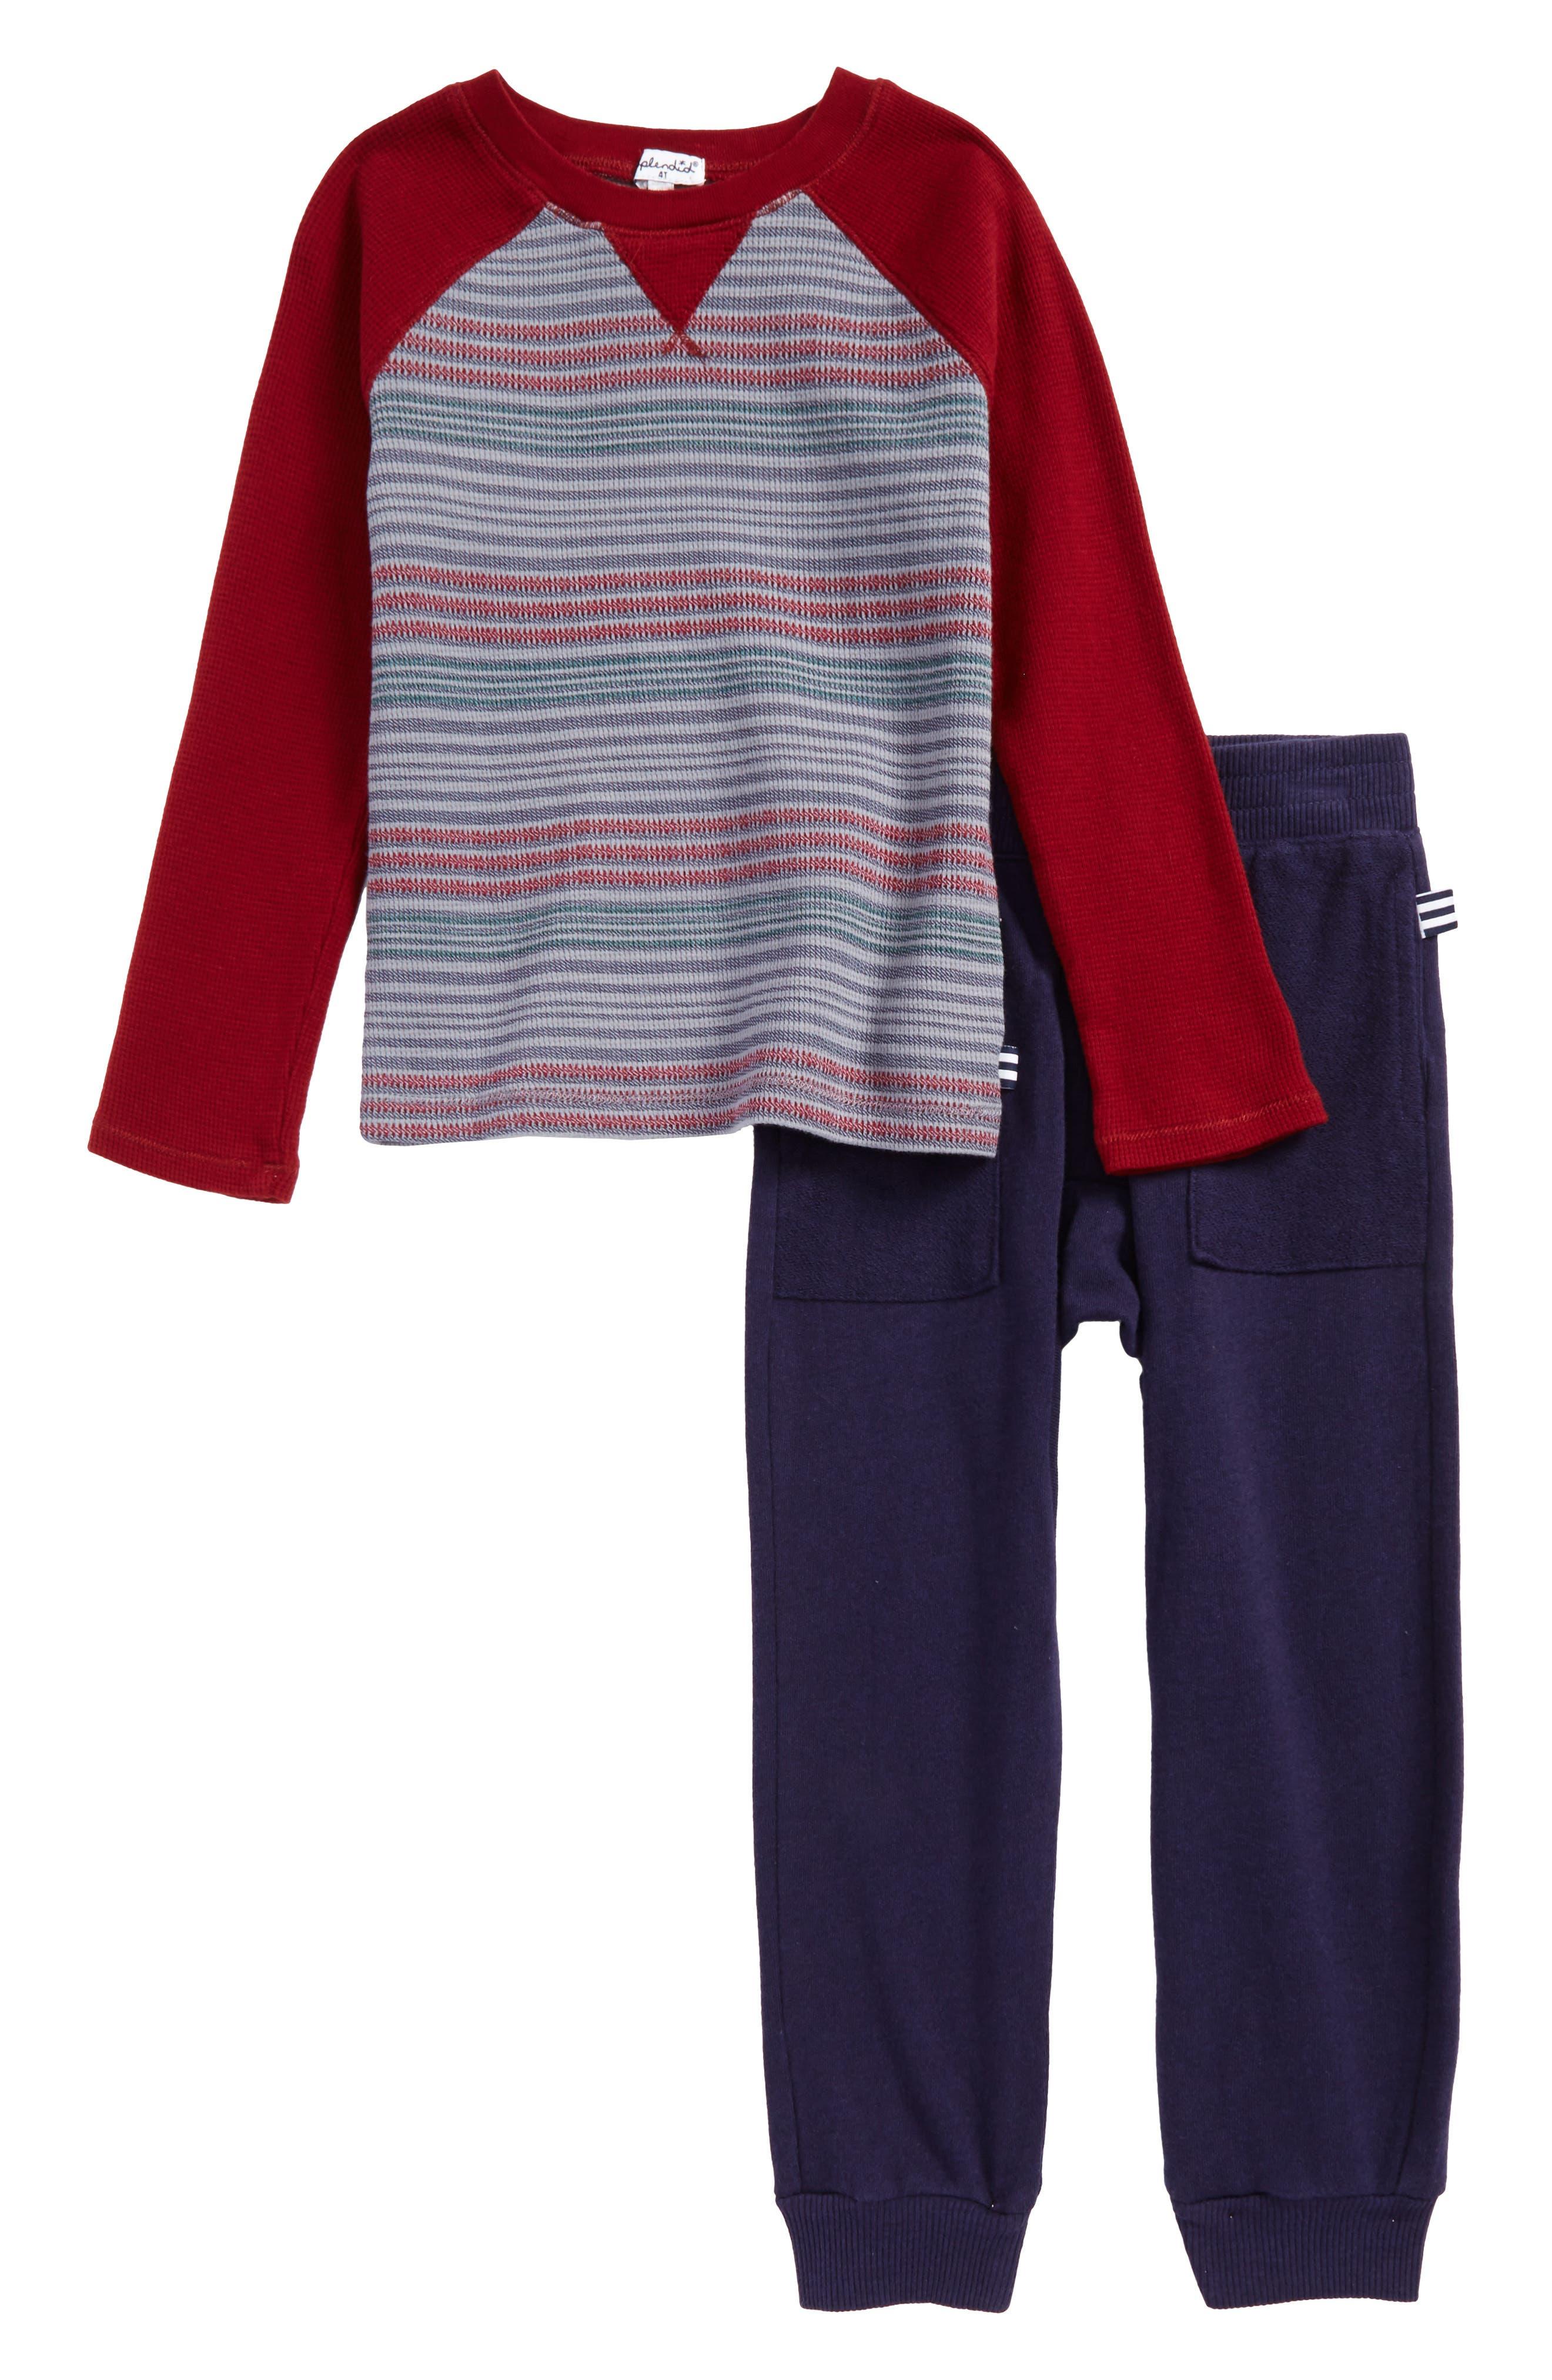 Main Image - Splendid Stripe Thermal T-Shirt & Sweatpants Set (Toddler Boys & Little Boys)